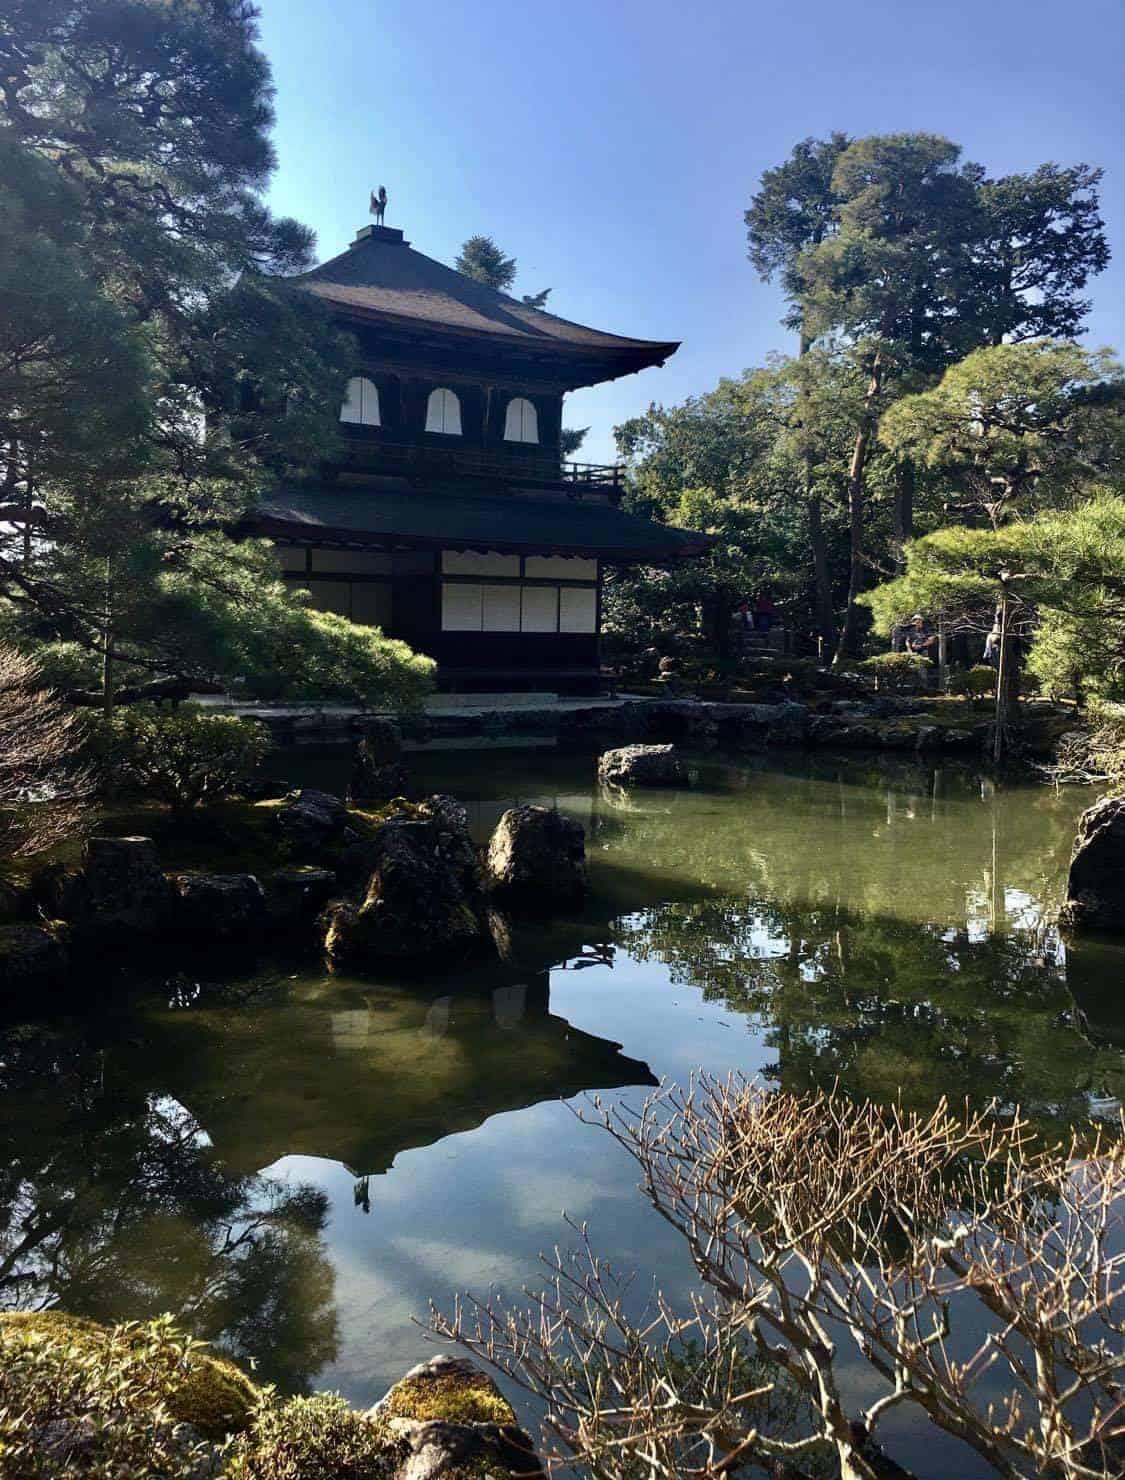 kyoto_essential_Philosopherspath_Point1_GINKAKUJI_2